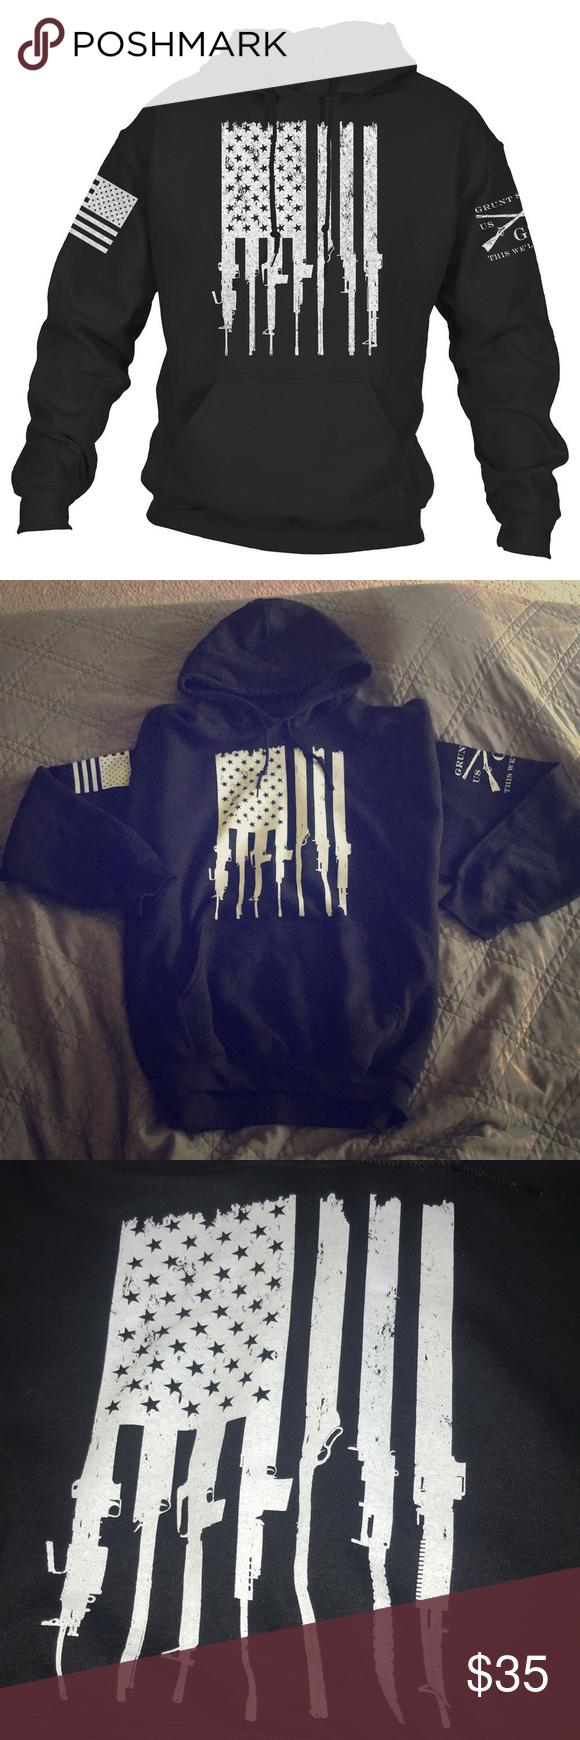 "b7602dae NWOT Grunt Style ""Rifle Flag"" hoodie Celebrate the 2nd Amendment of the  United States"